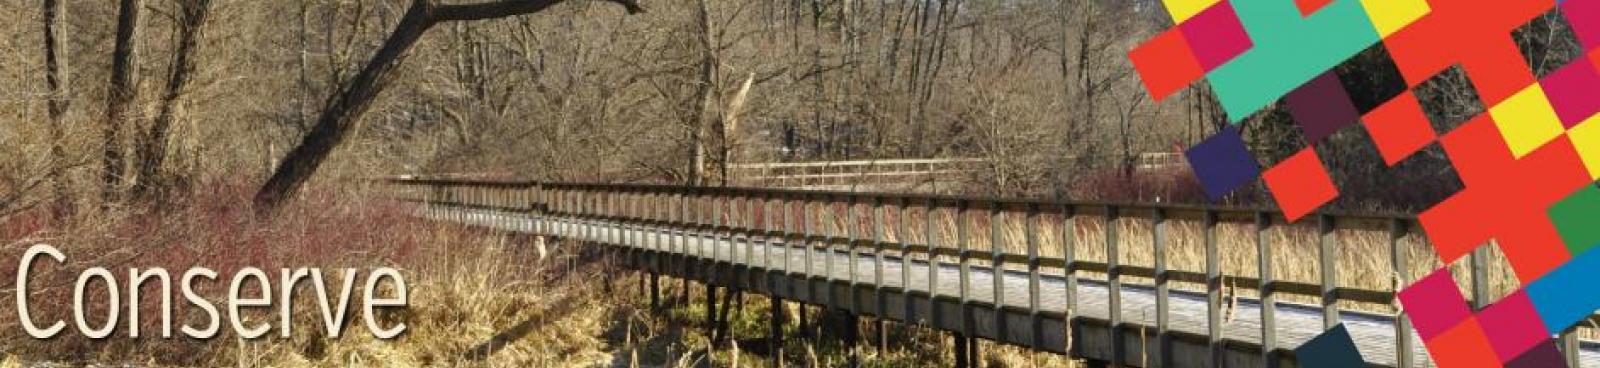 Conserve - Woods